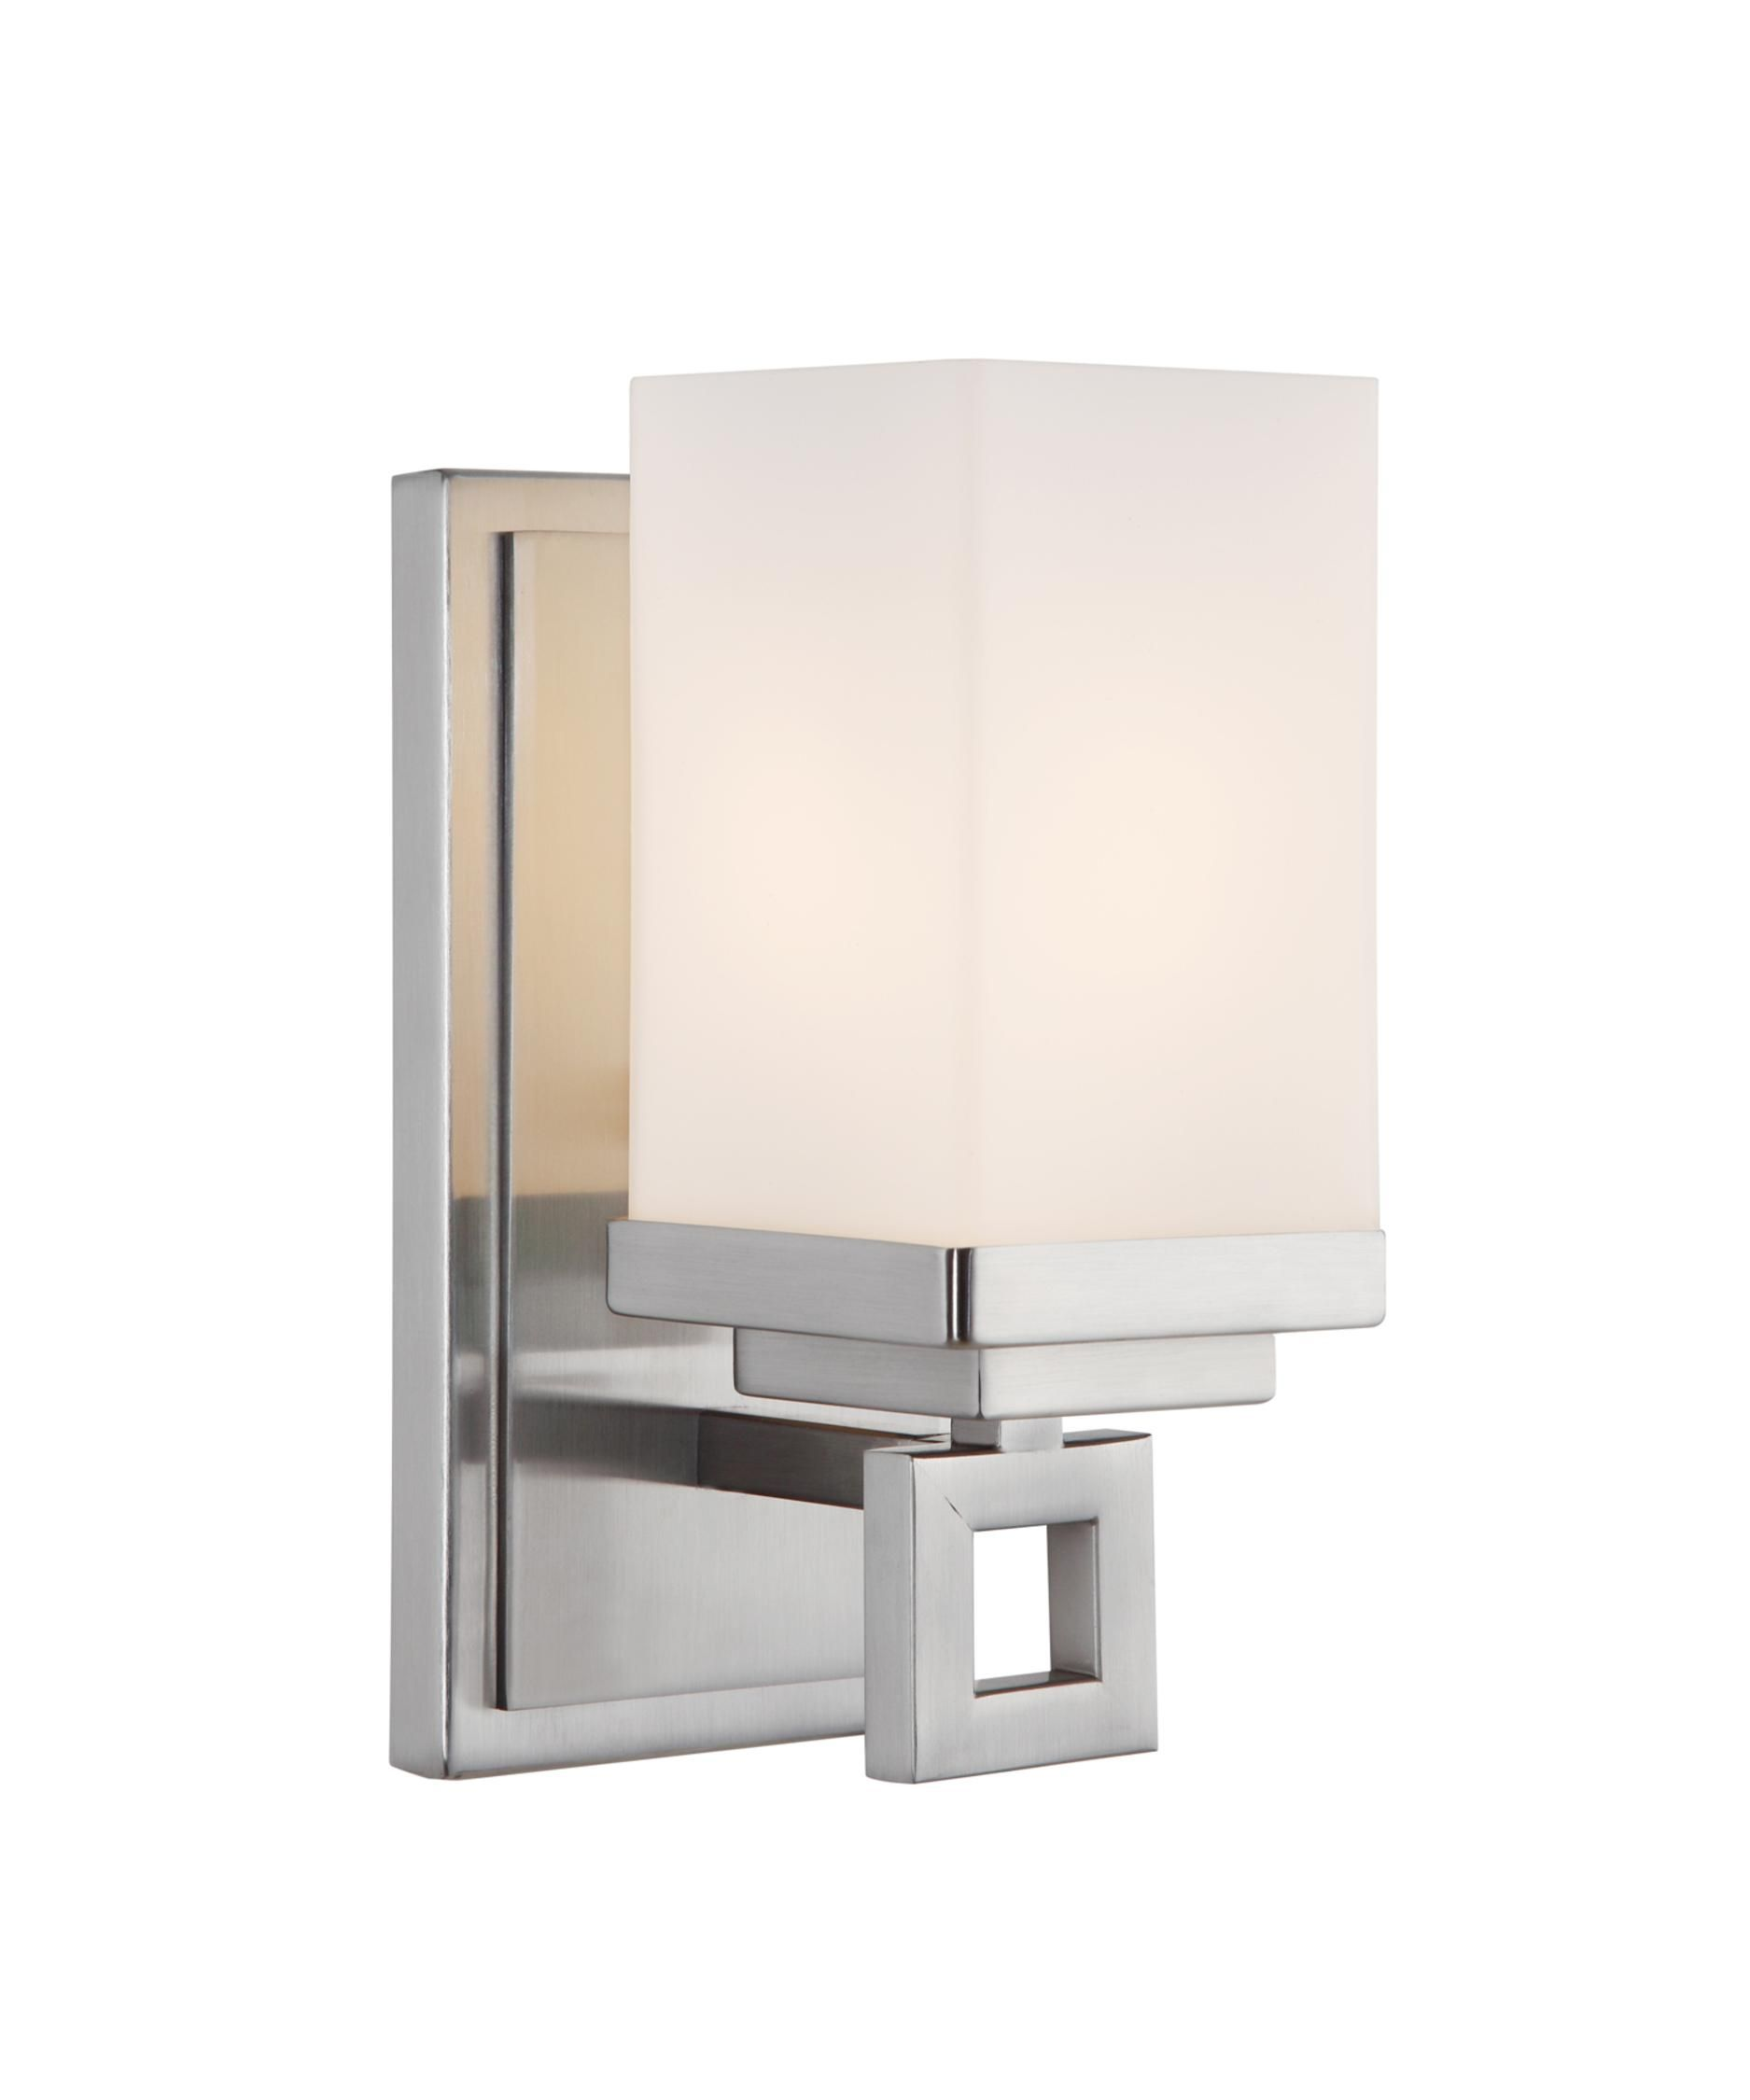 lights light vanity bathroom bath capitol quinton inch wide quoizel